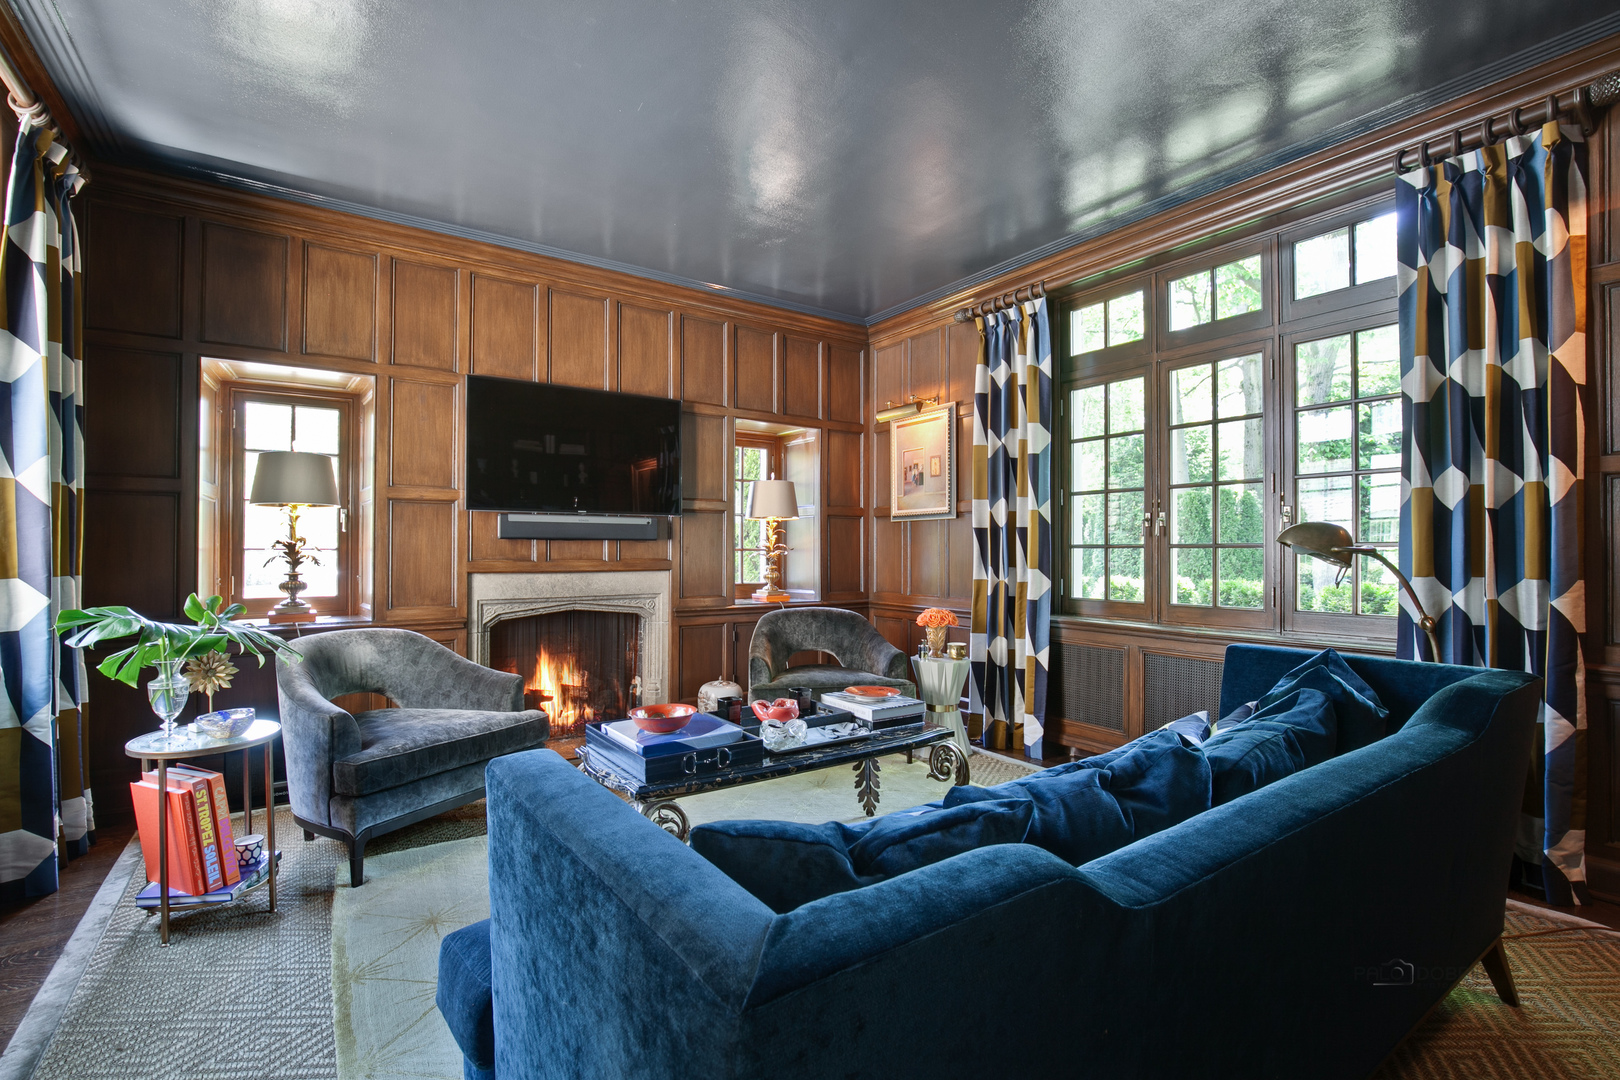 800 North Sheridan, Lake Forest, Illinois, 60045